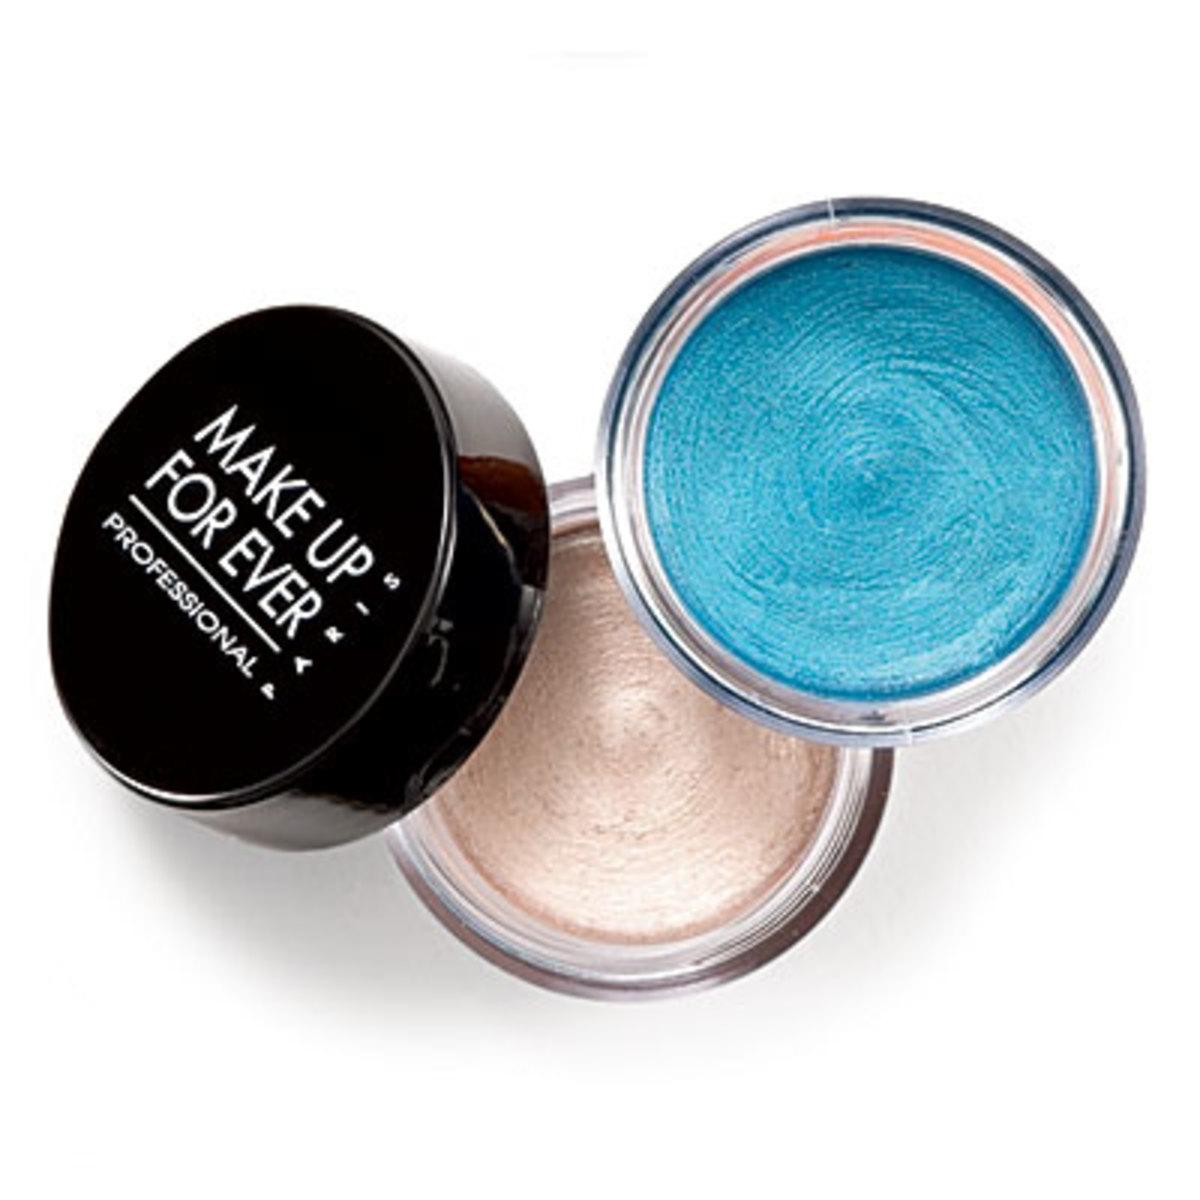 MUFE-Aqua-Cream-Eyeshadows